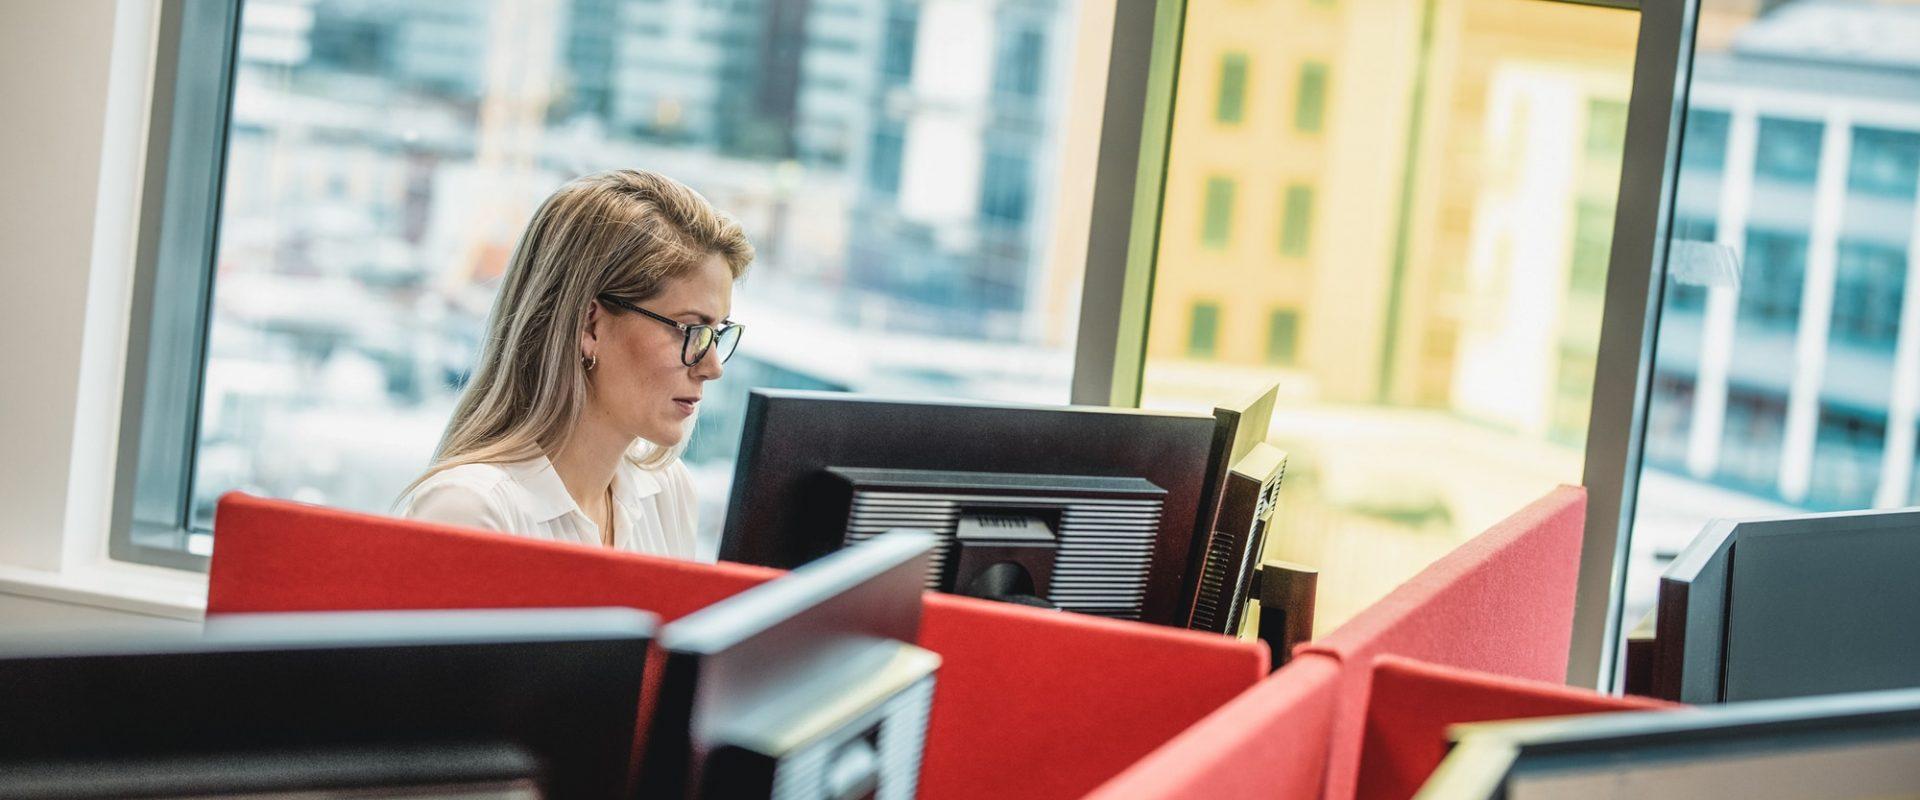 Kvinne foran datamaskin i kontorlandskap hos Inventura.